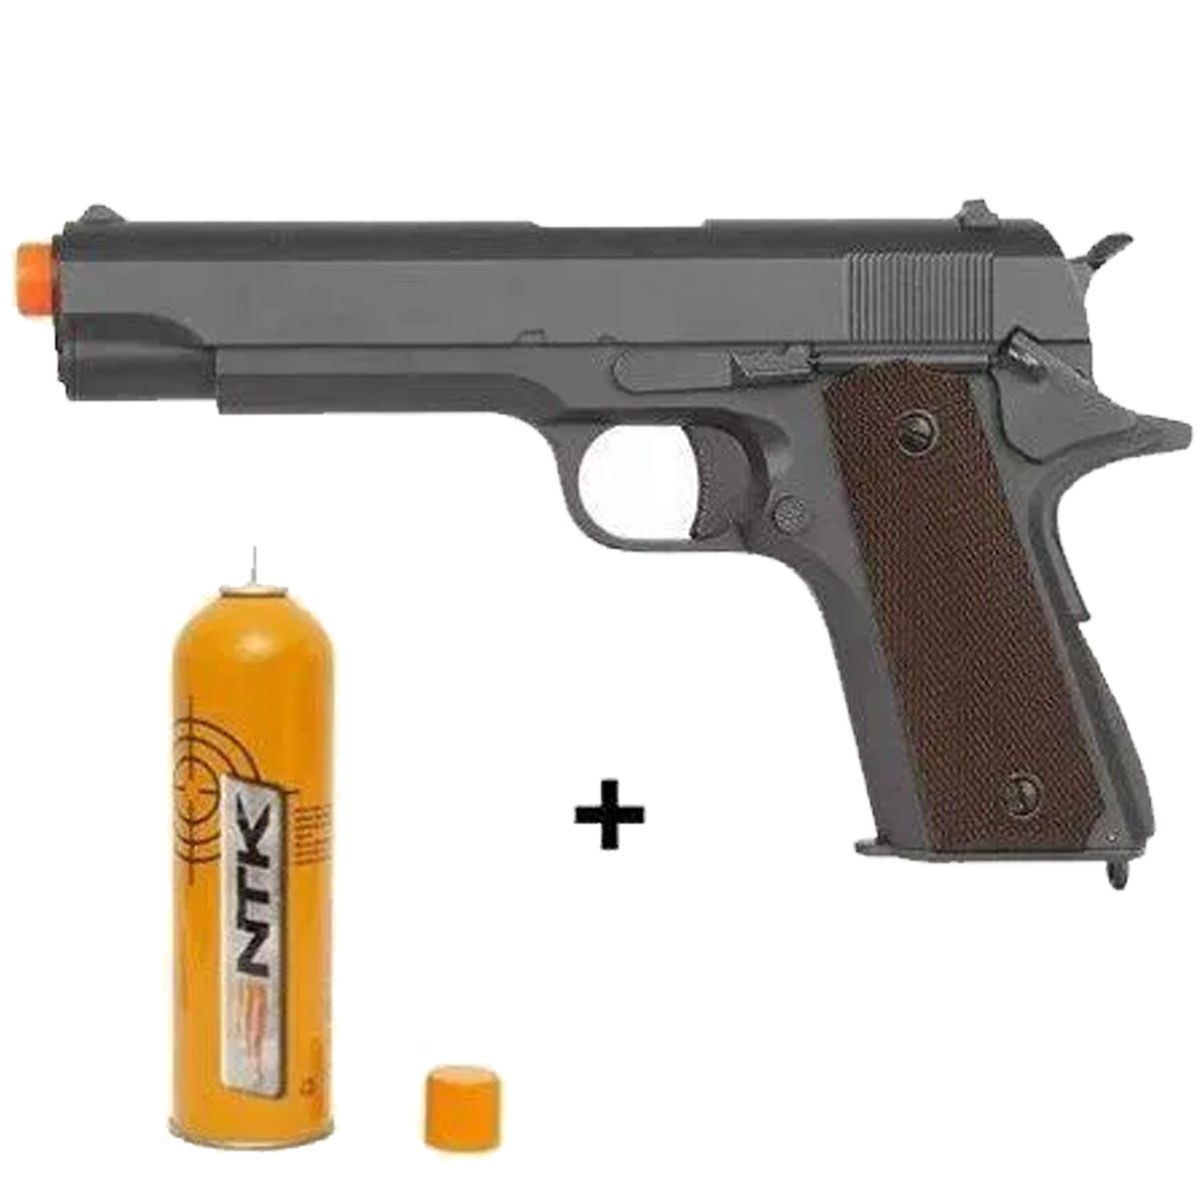 Pistola Airsoft 6mm Gbb Blowback R31-C M1911 A1 Cinza + Green Gás